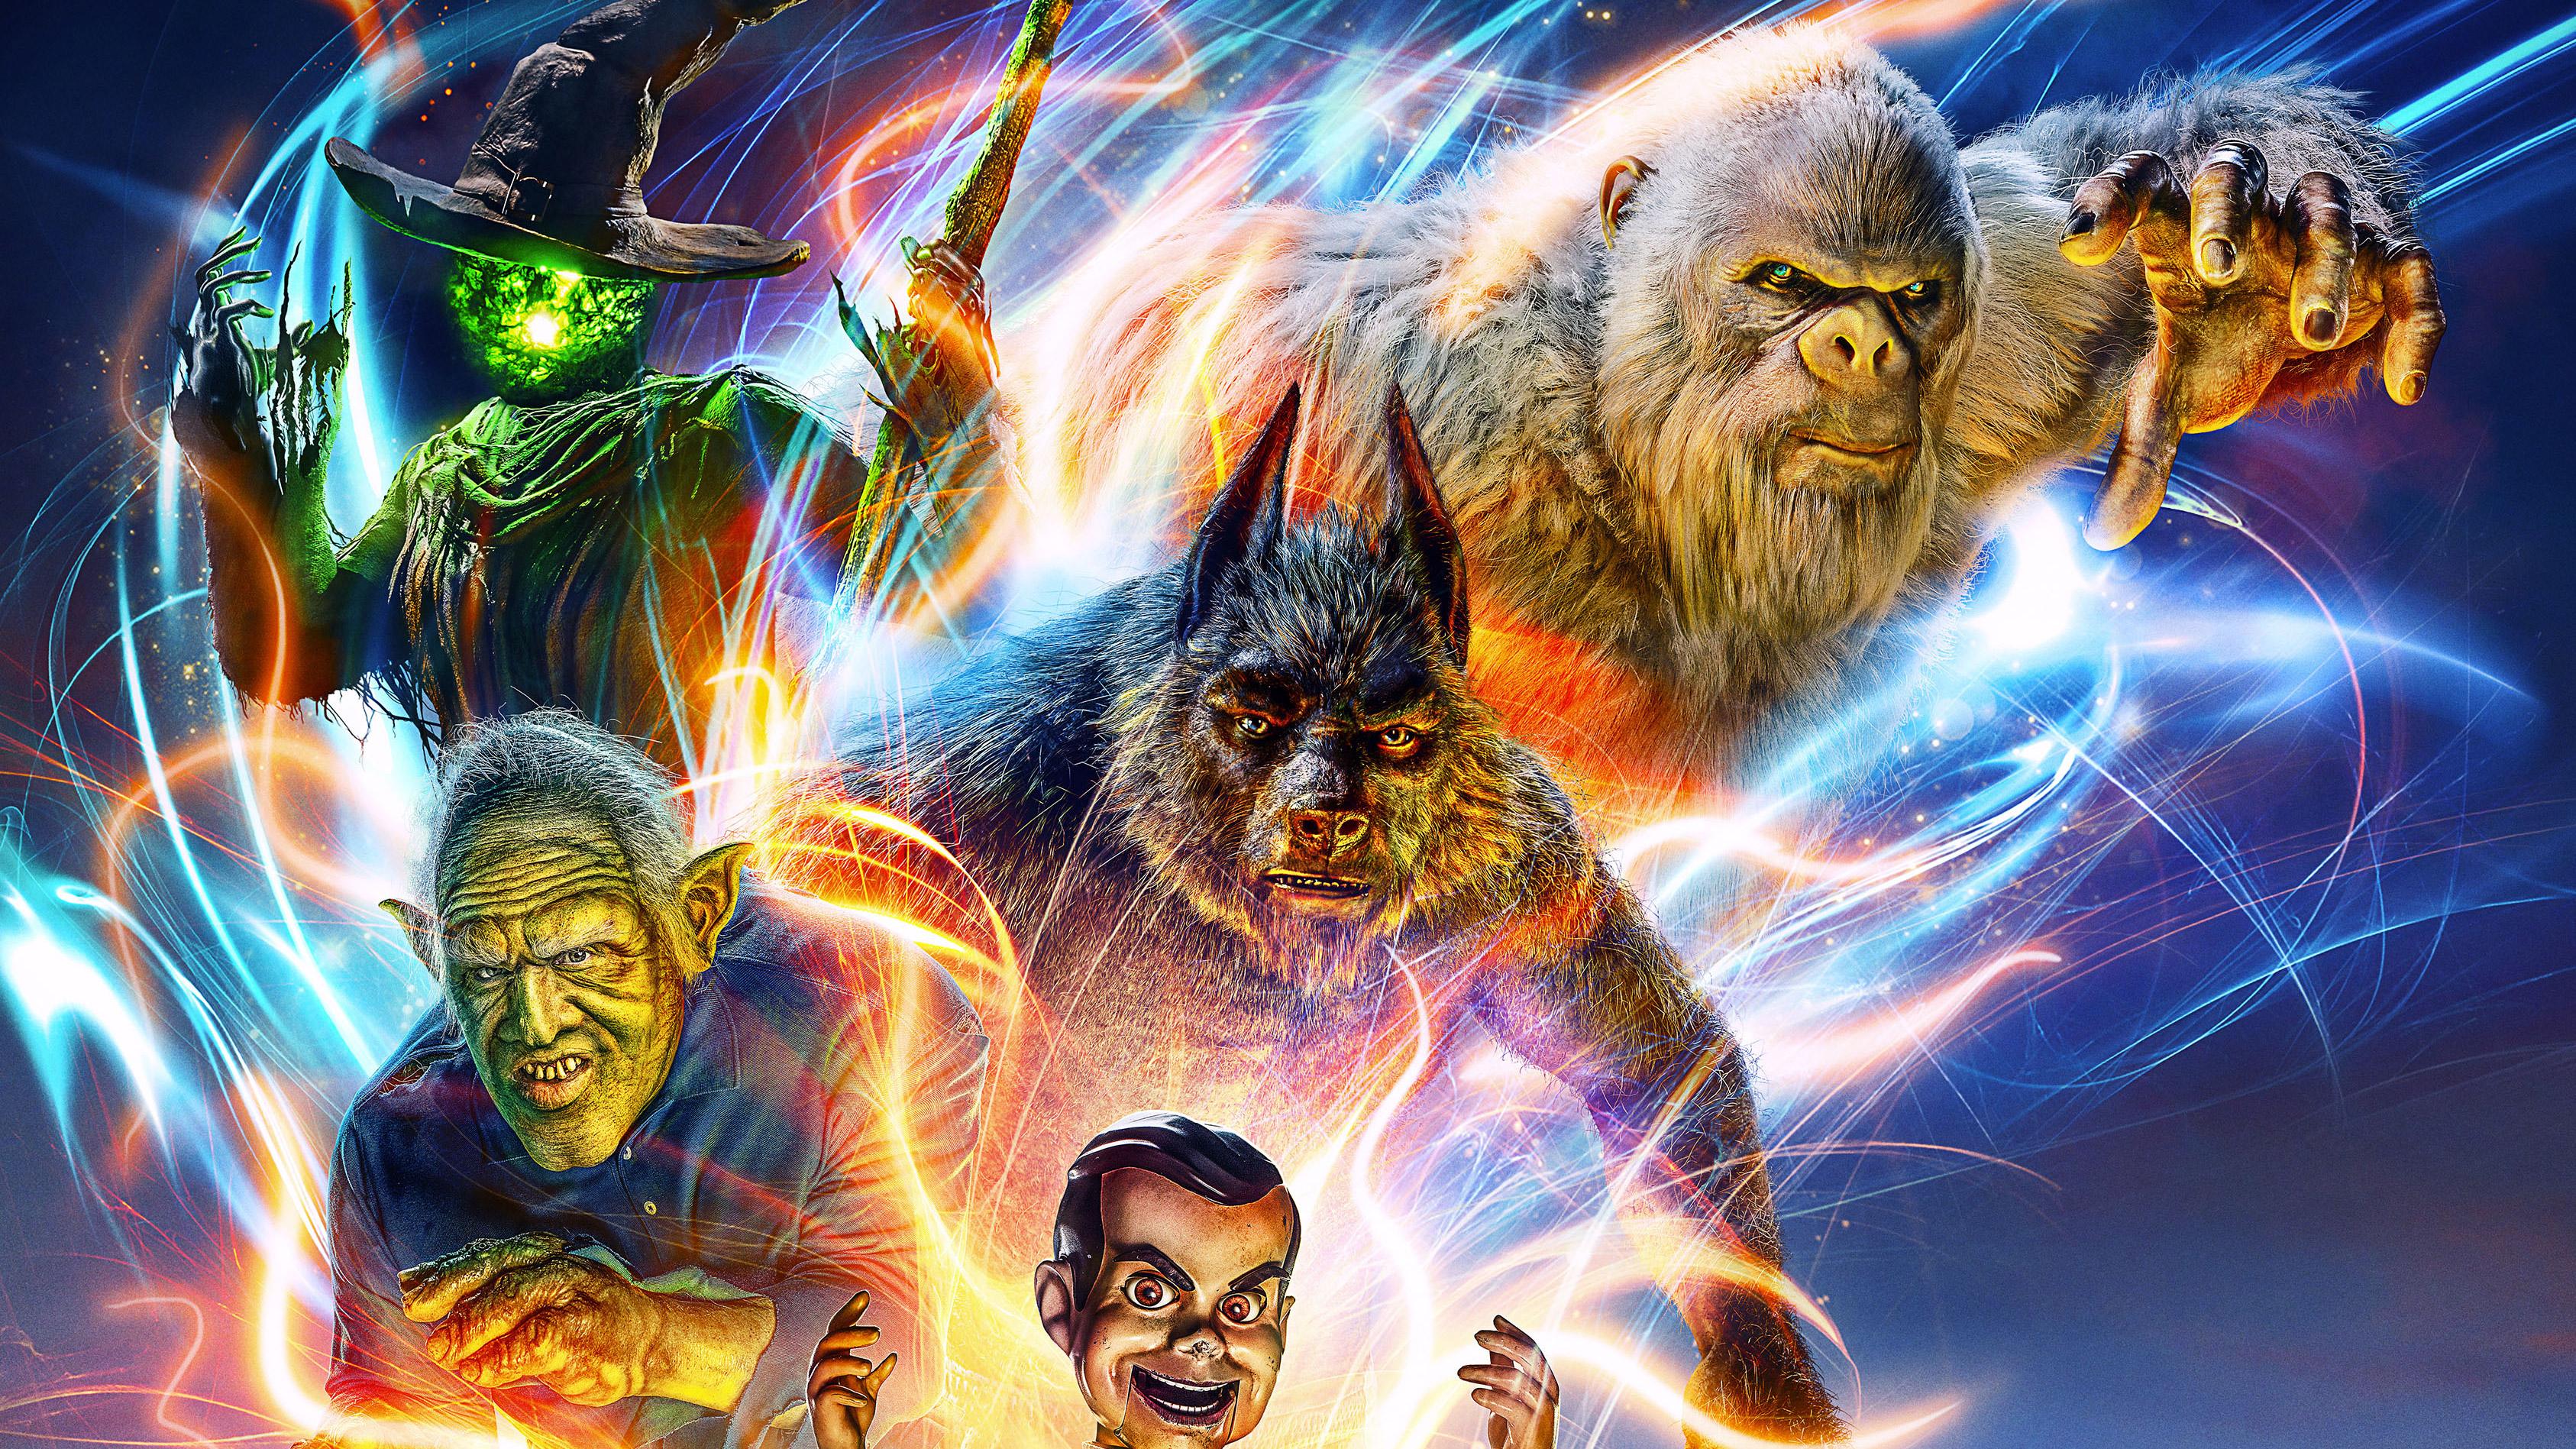 Goosebumps 2 Haunted Halloween Uk Poster 4k, HD Movies, 4k ...